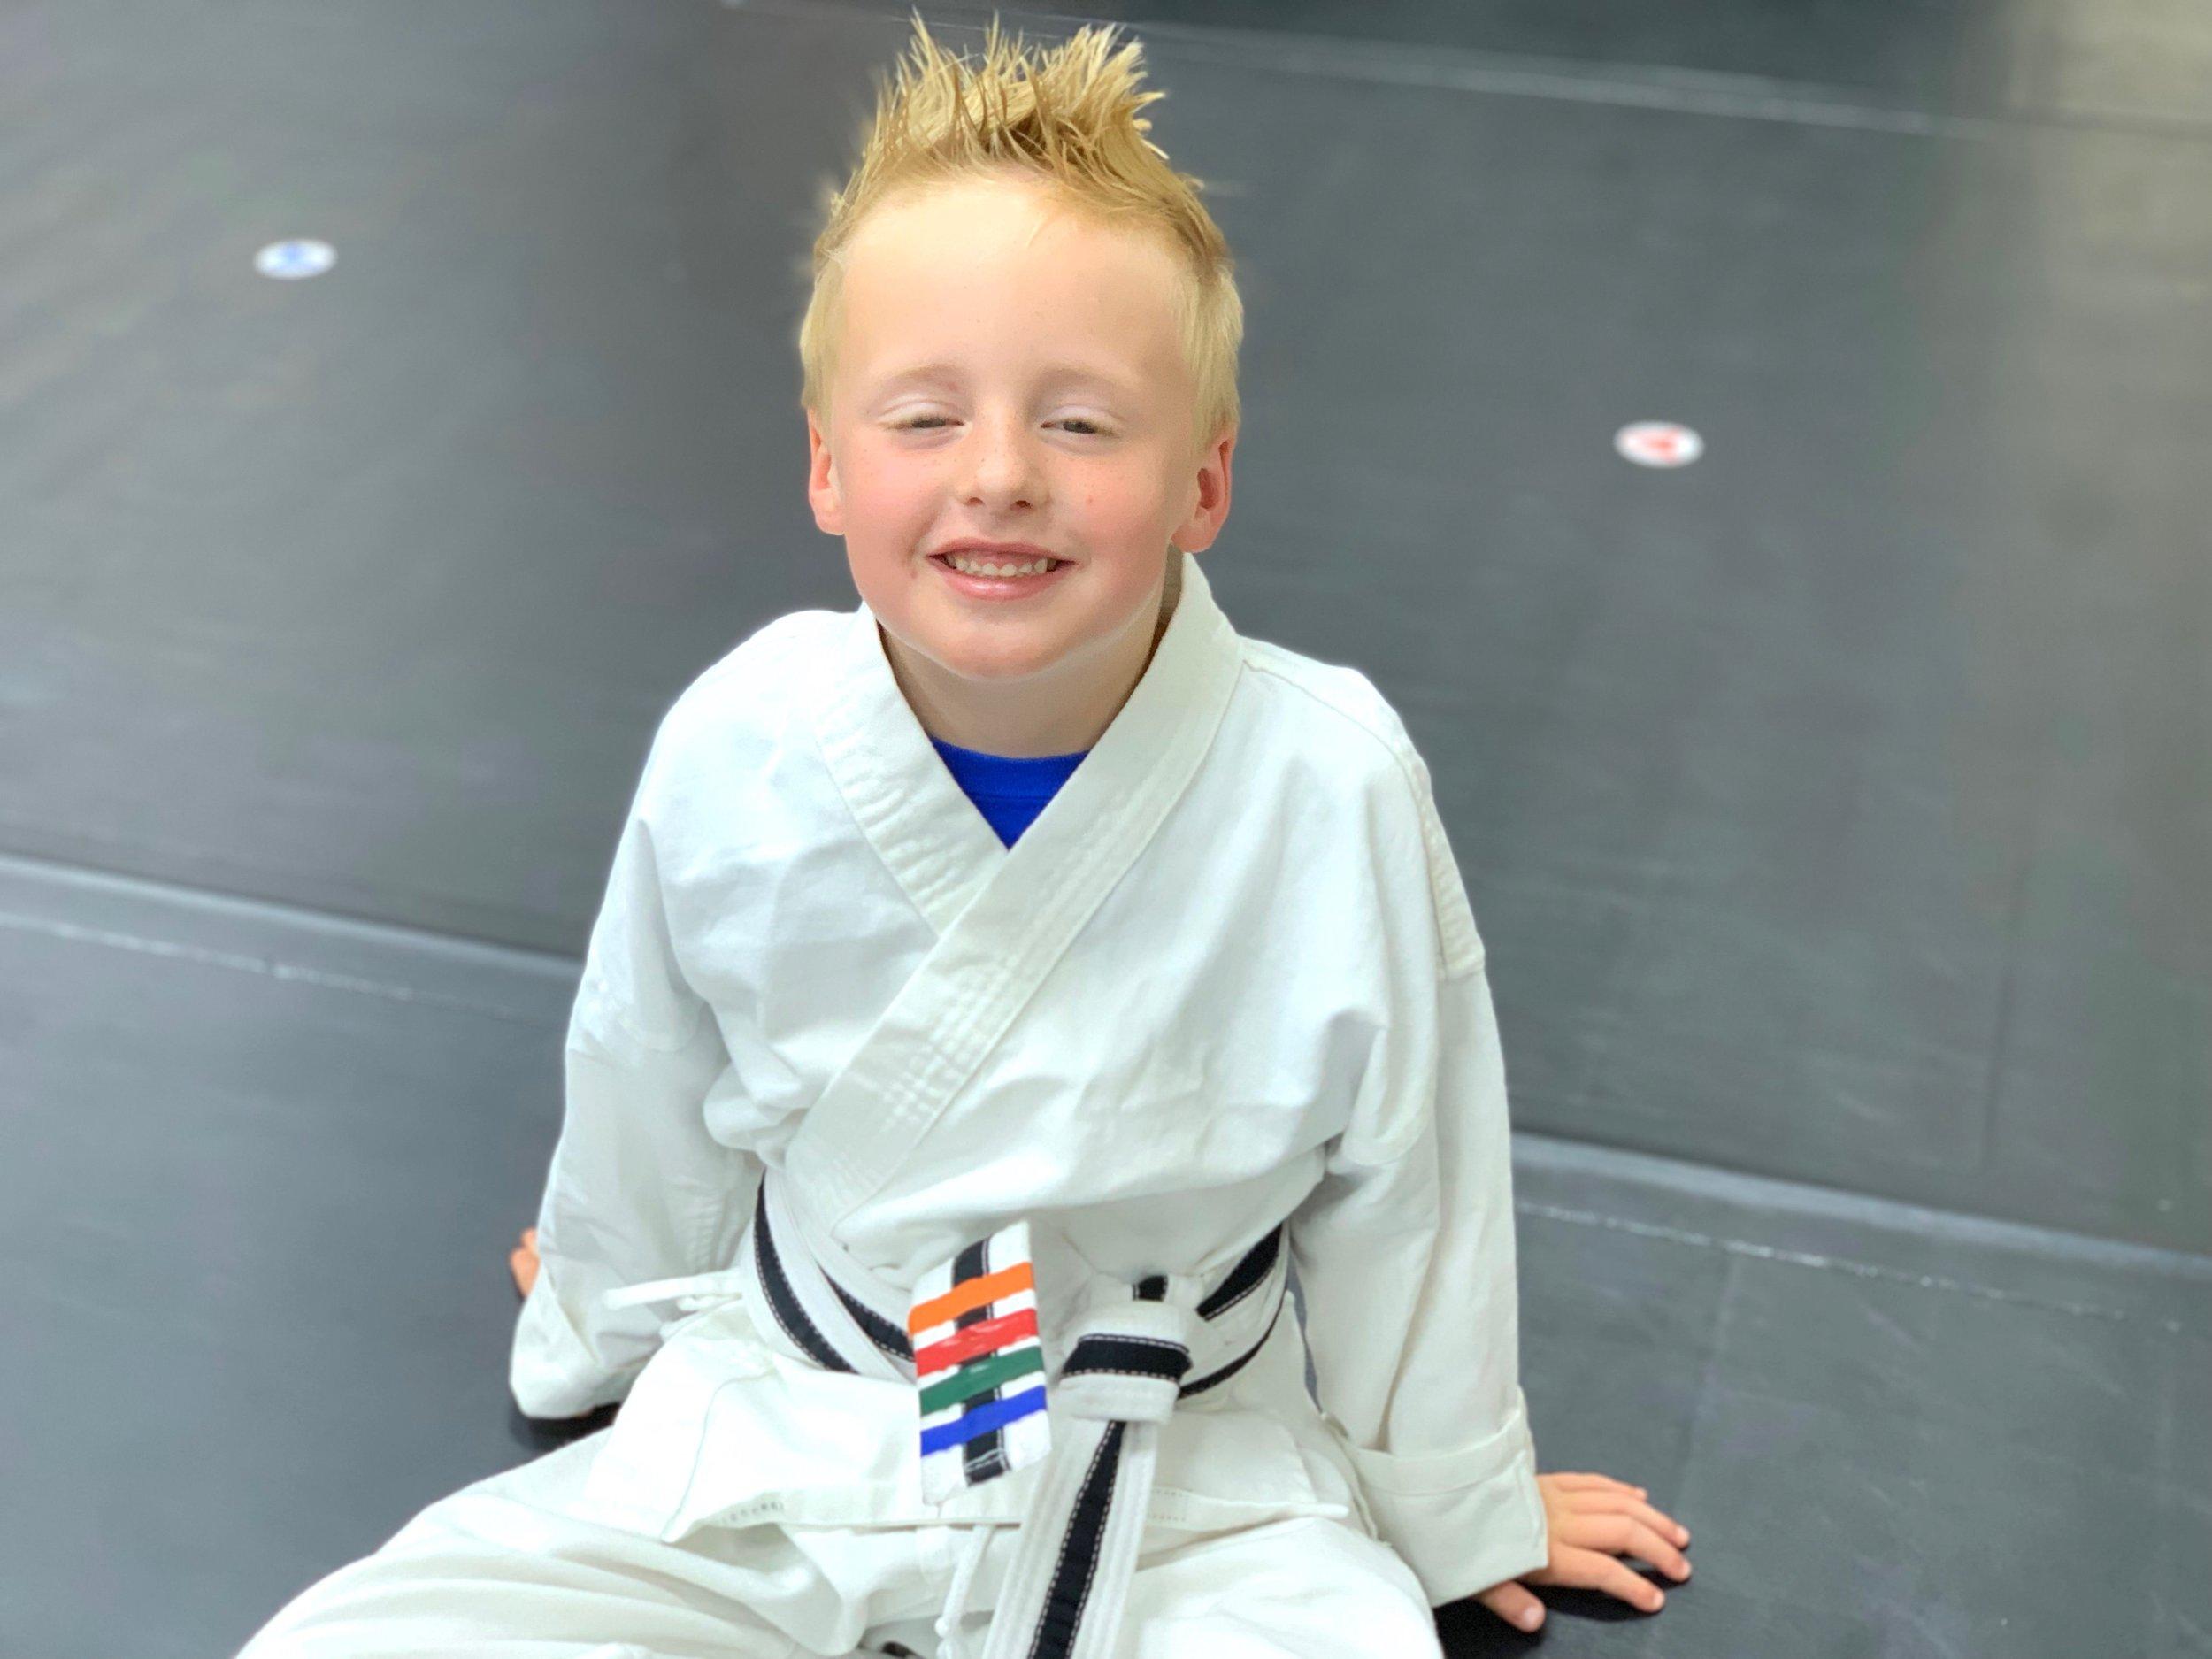 karate-kids-program-souhtlake-keller-grapevine-texas00015.jpeg